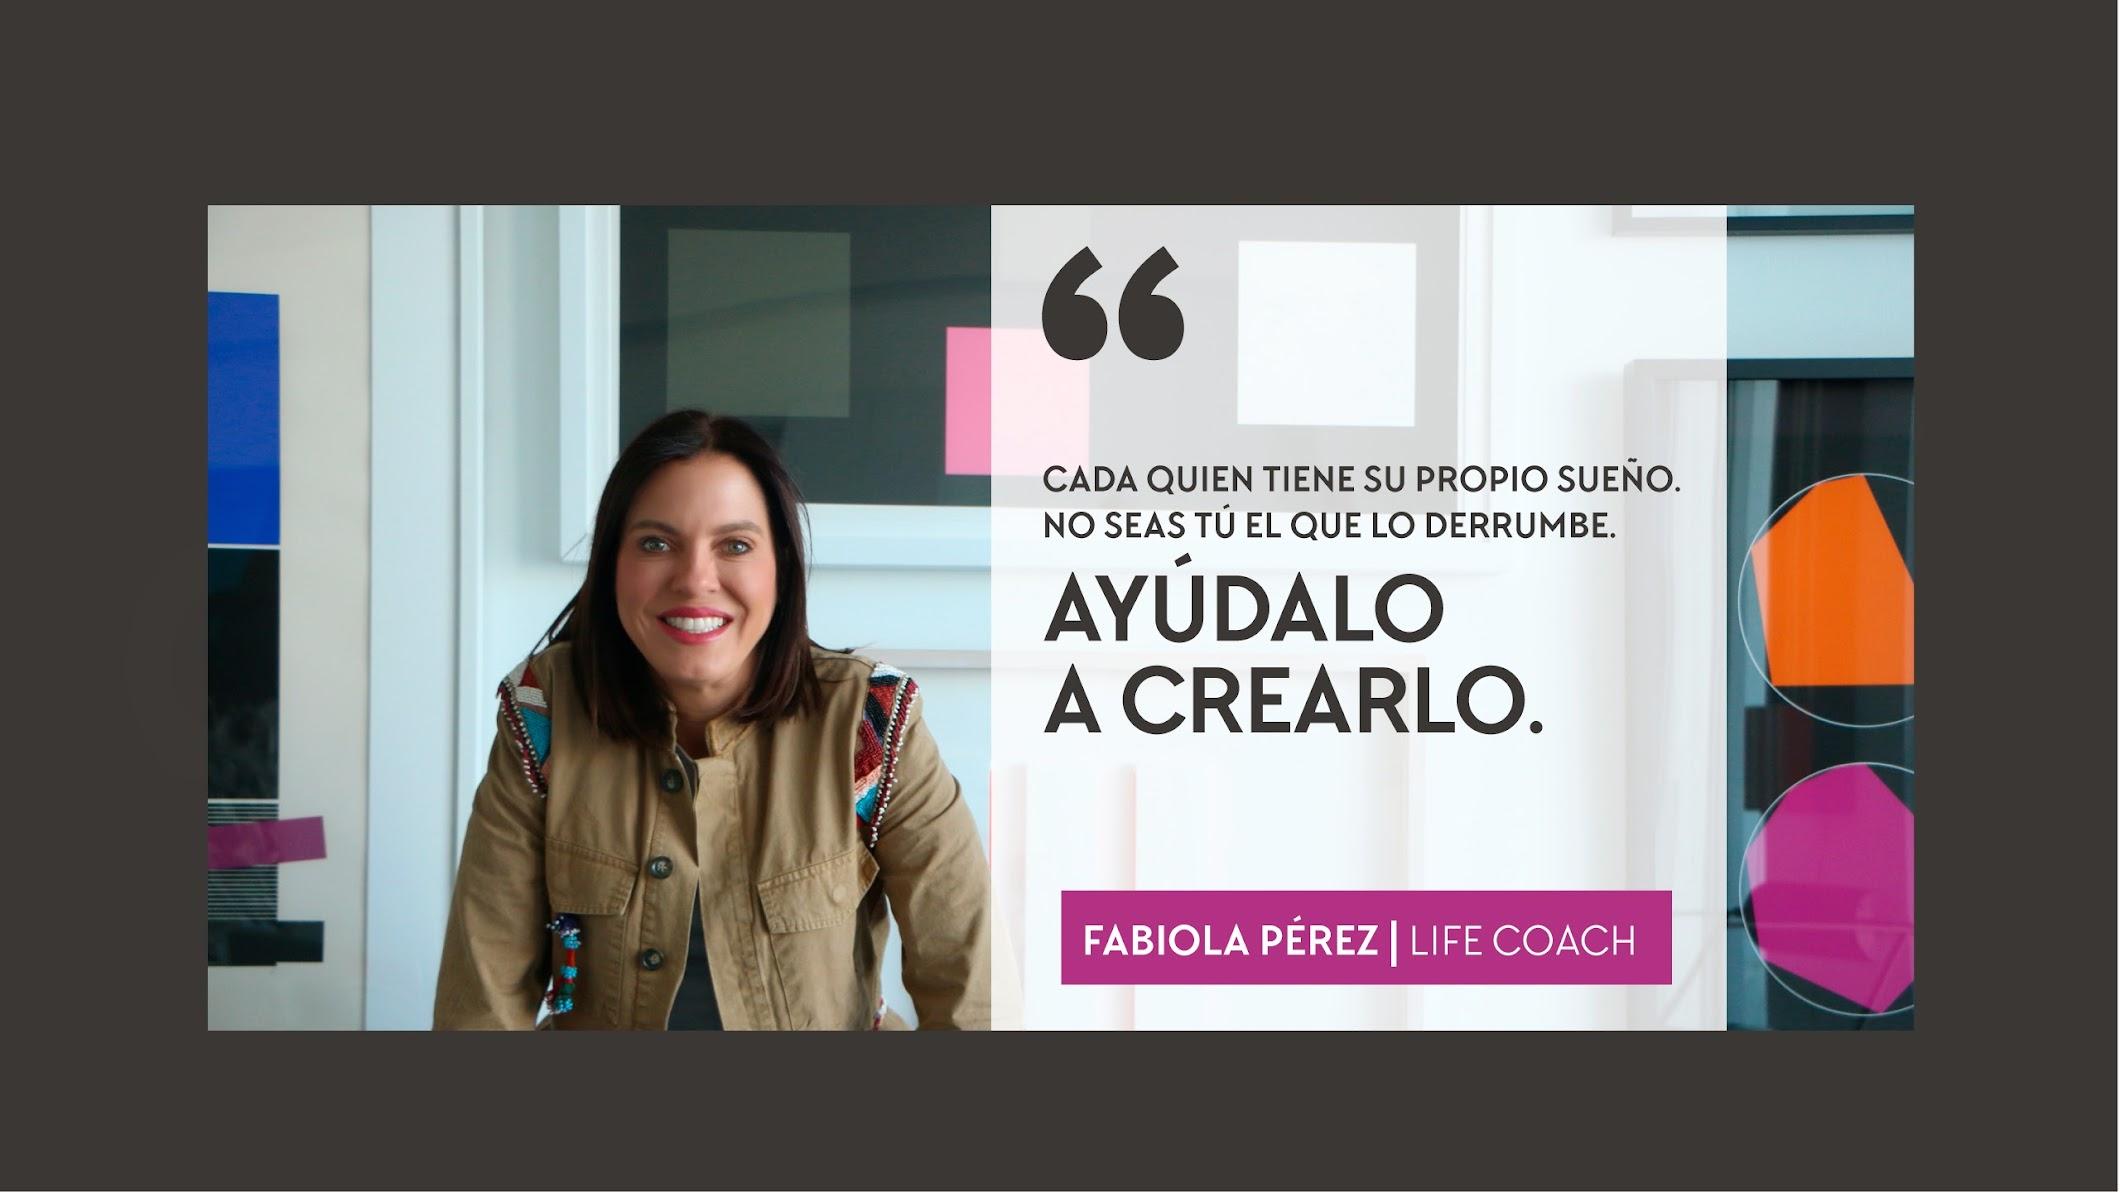 Fabiola Pérez Olalde